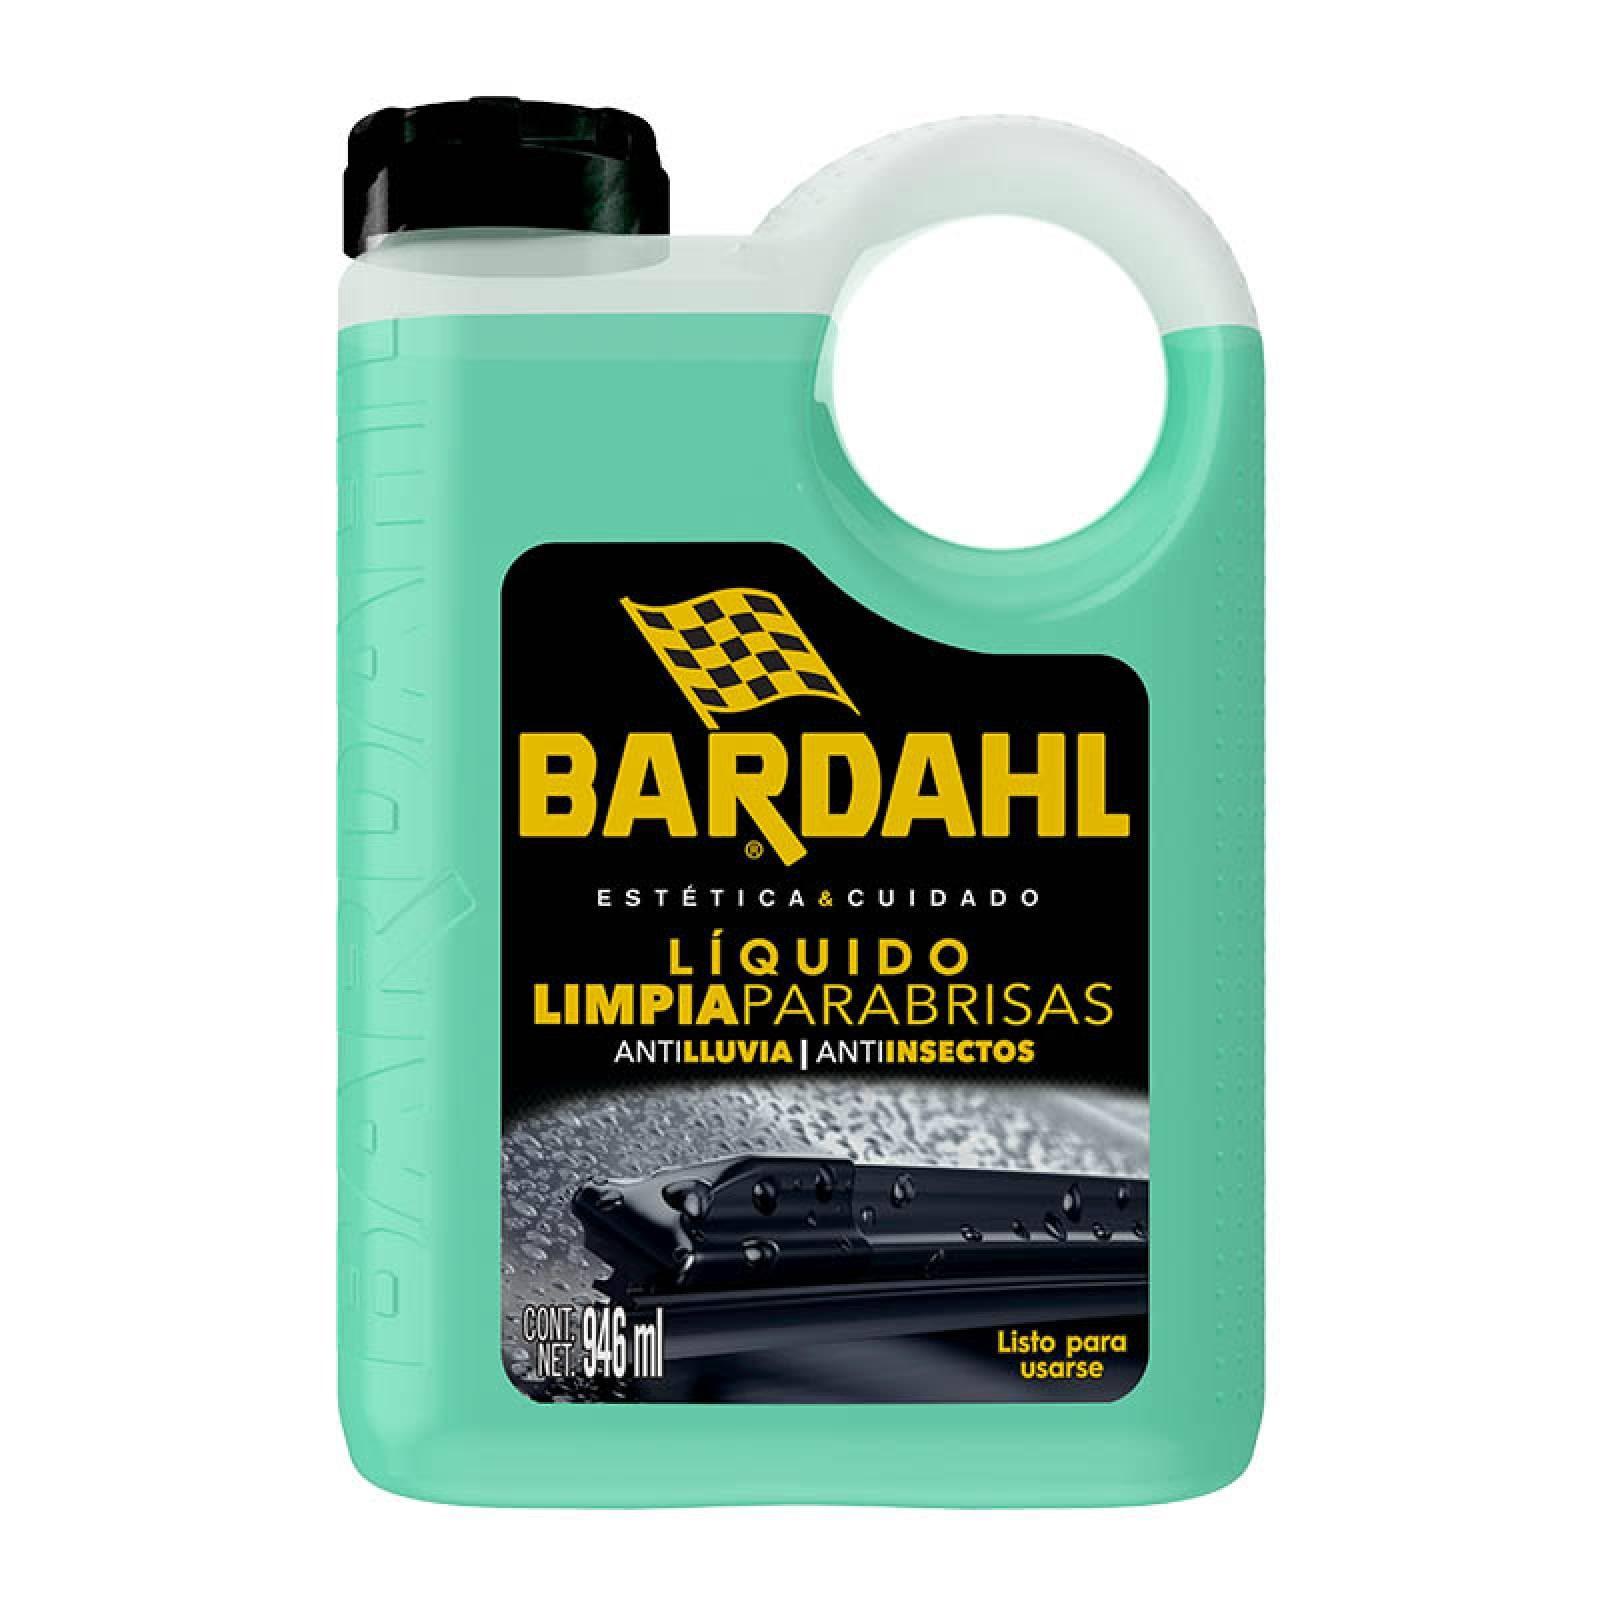 Bardahl Limpia Parabrisas Anti-Lluvia Anti-Insectos 946 Ml